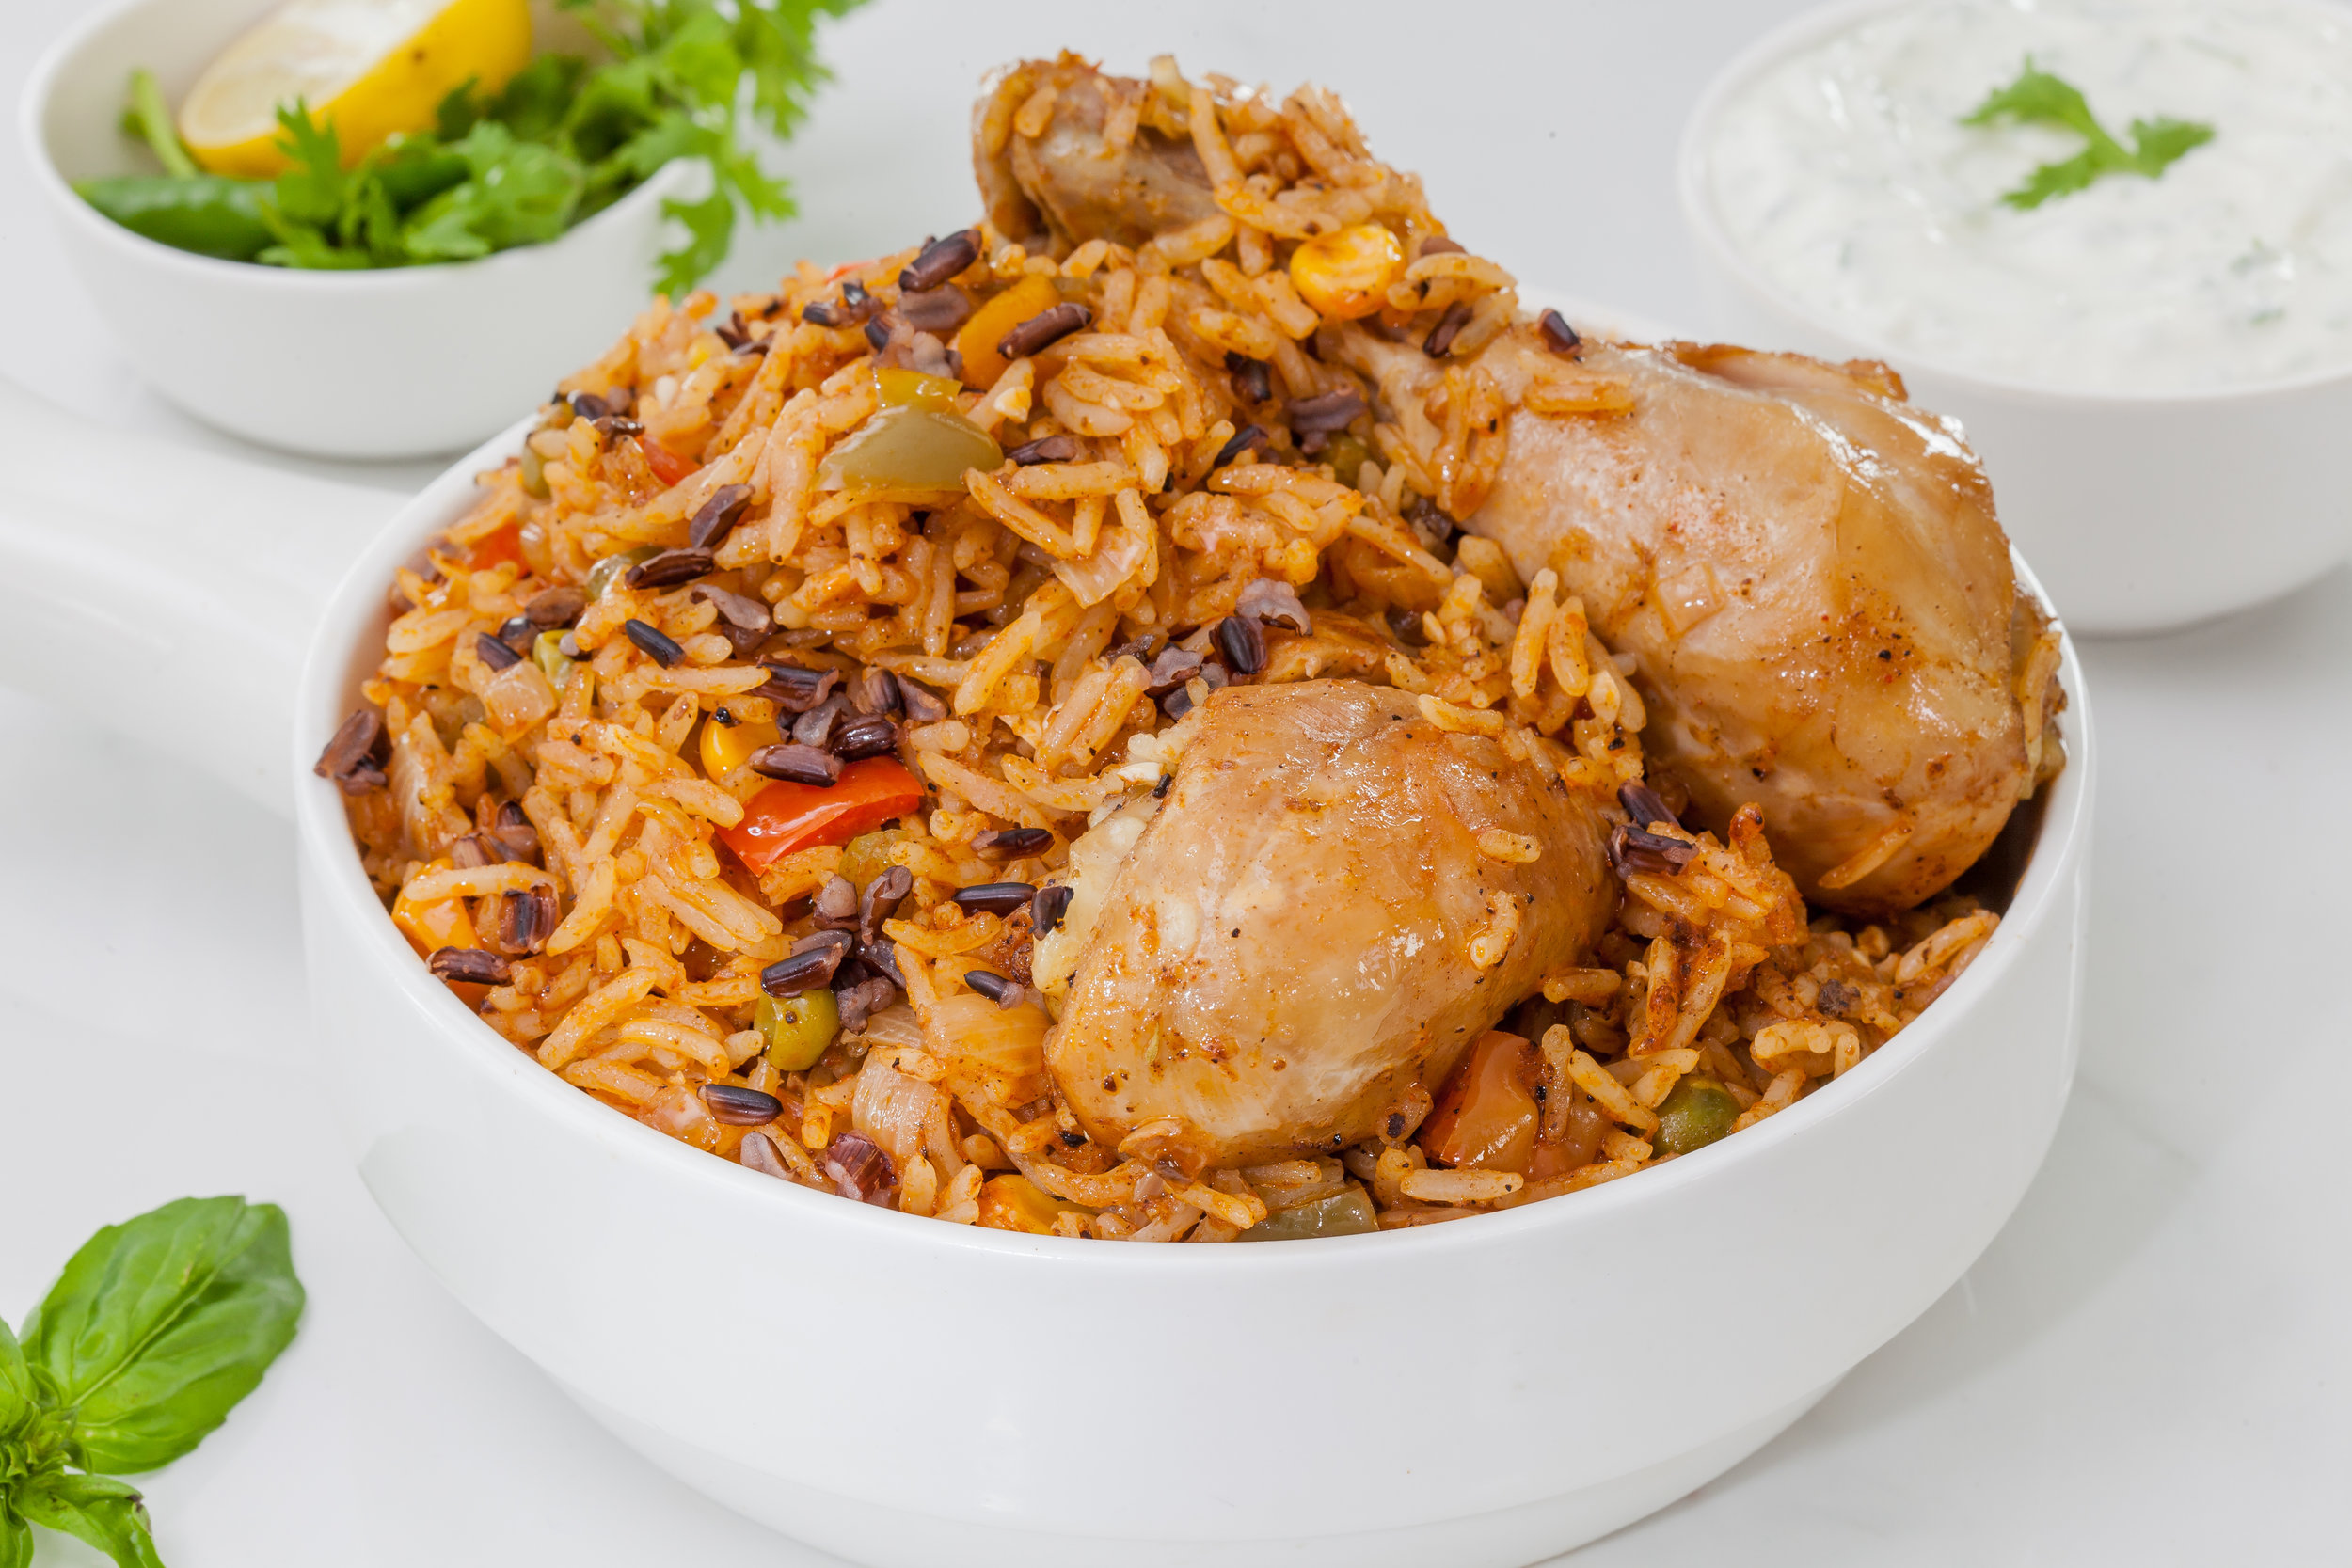 _17FM04043_arroz con chicken _Cuban.jpg